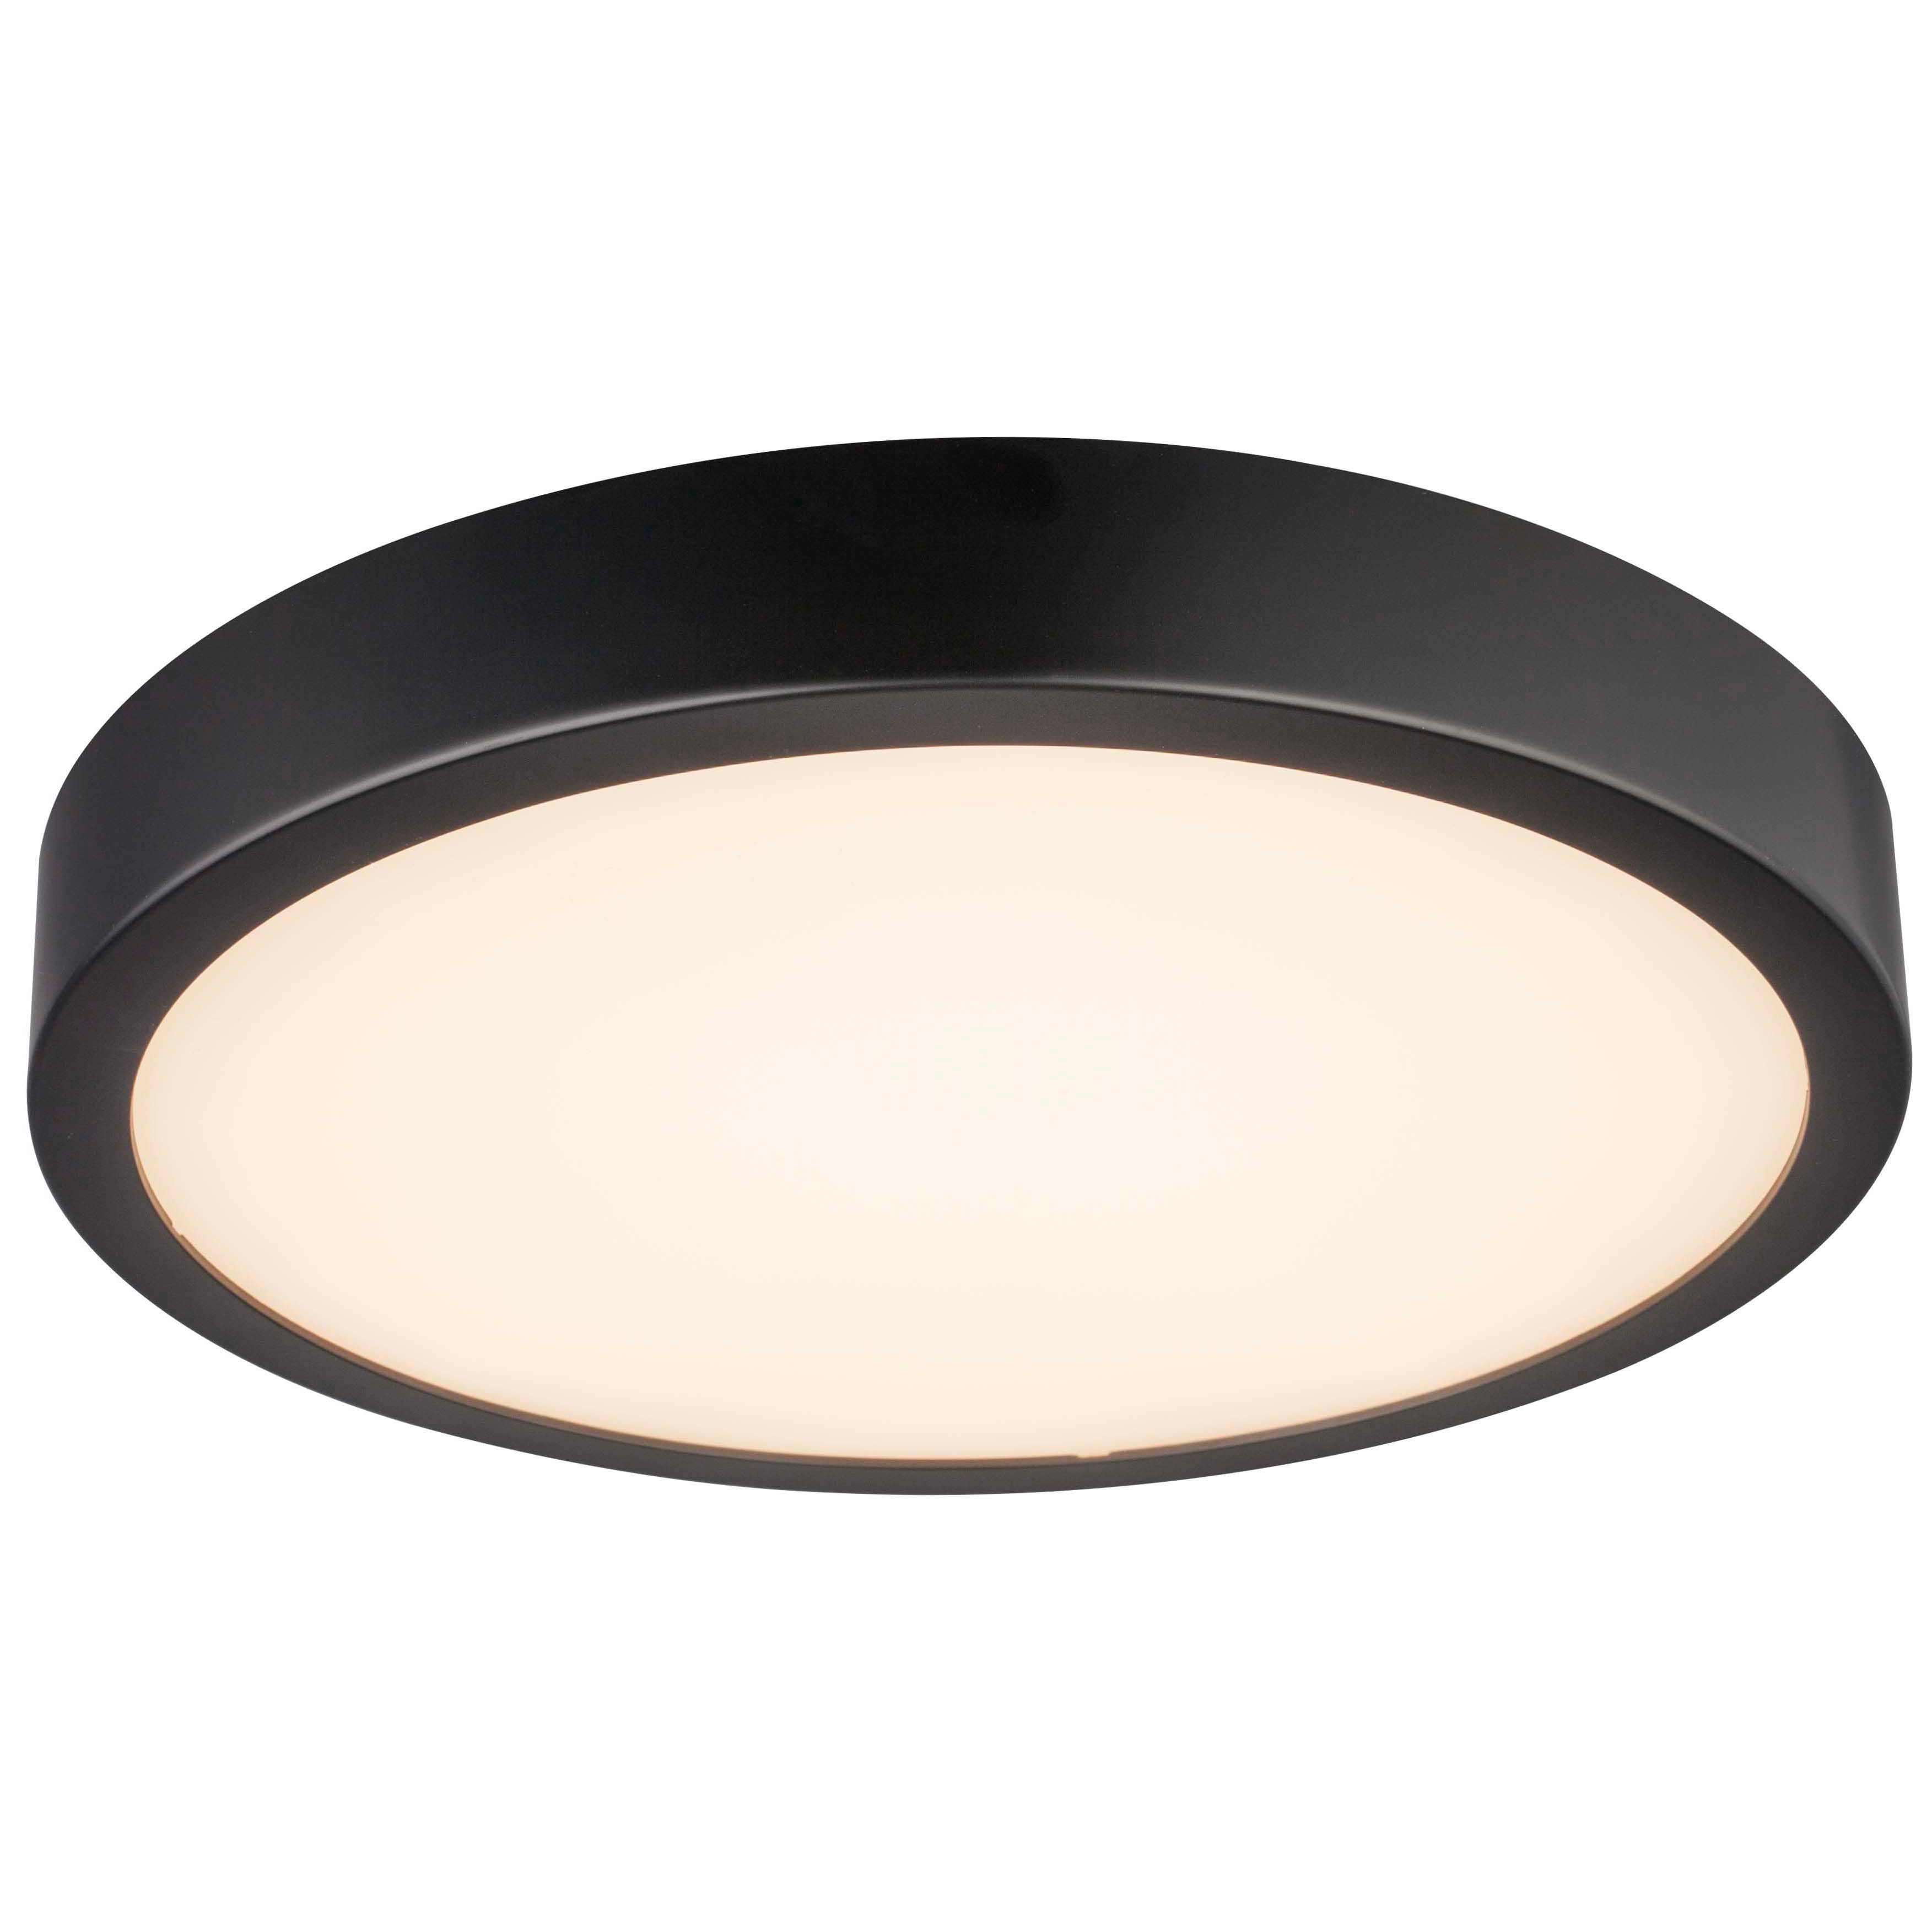 on sale 0027c 932c4 Jenner Plastic Black External Wall Light